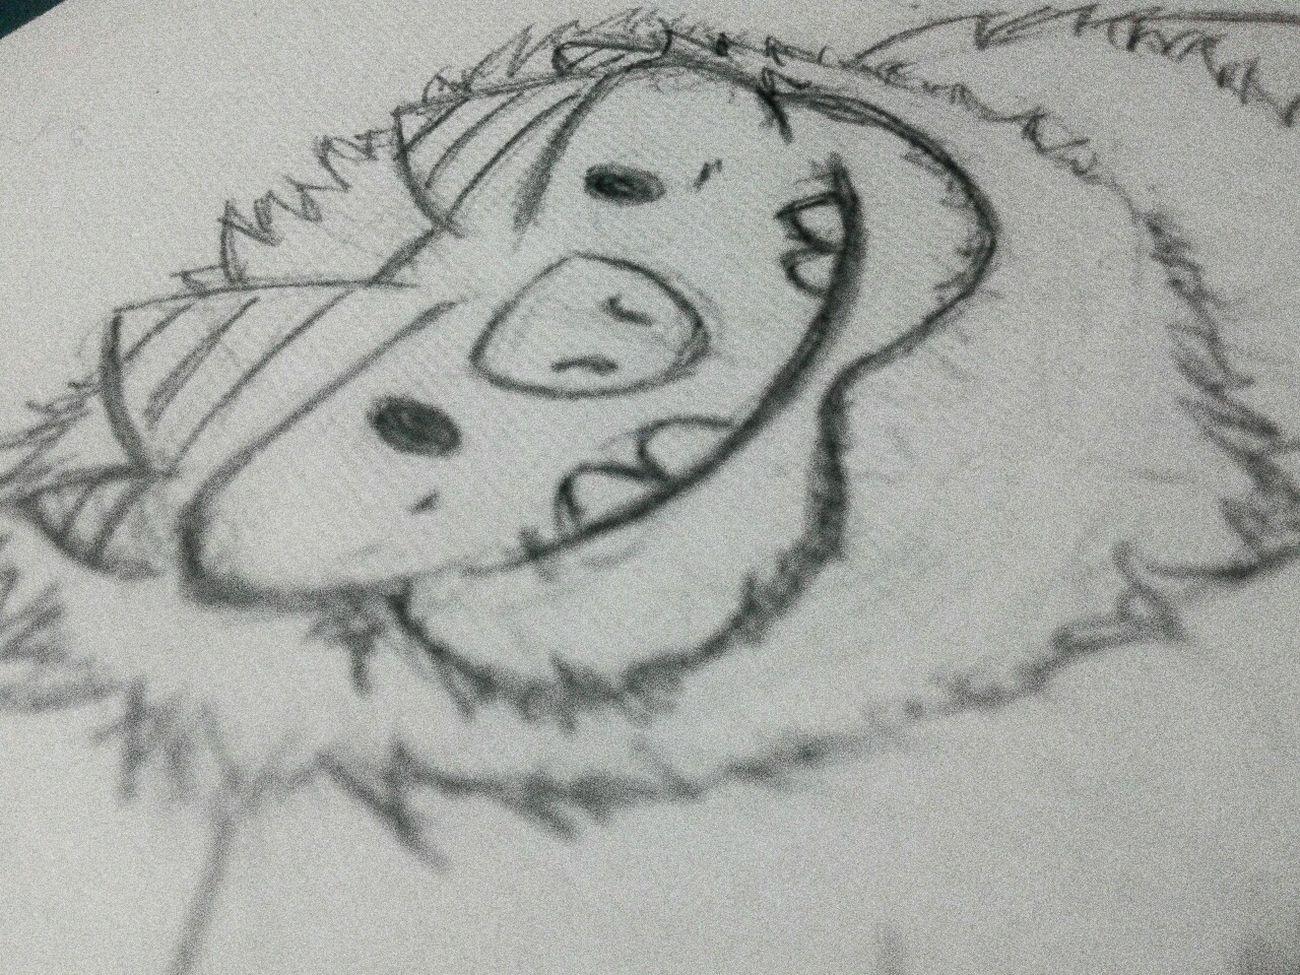 Wooo ArtWork Art And Craft Close-up Netflix Design Drawing Drawing ✏ Draw Trollhunter Troll